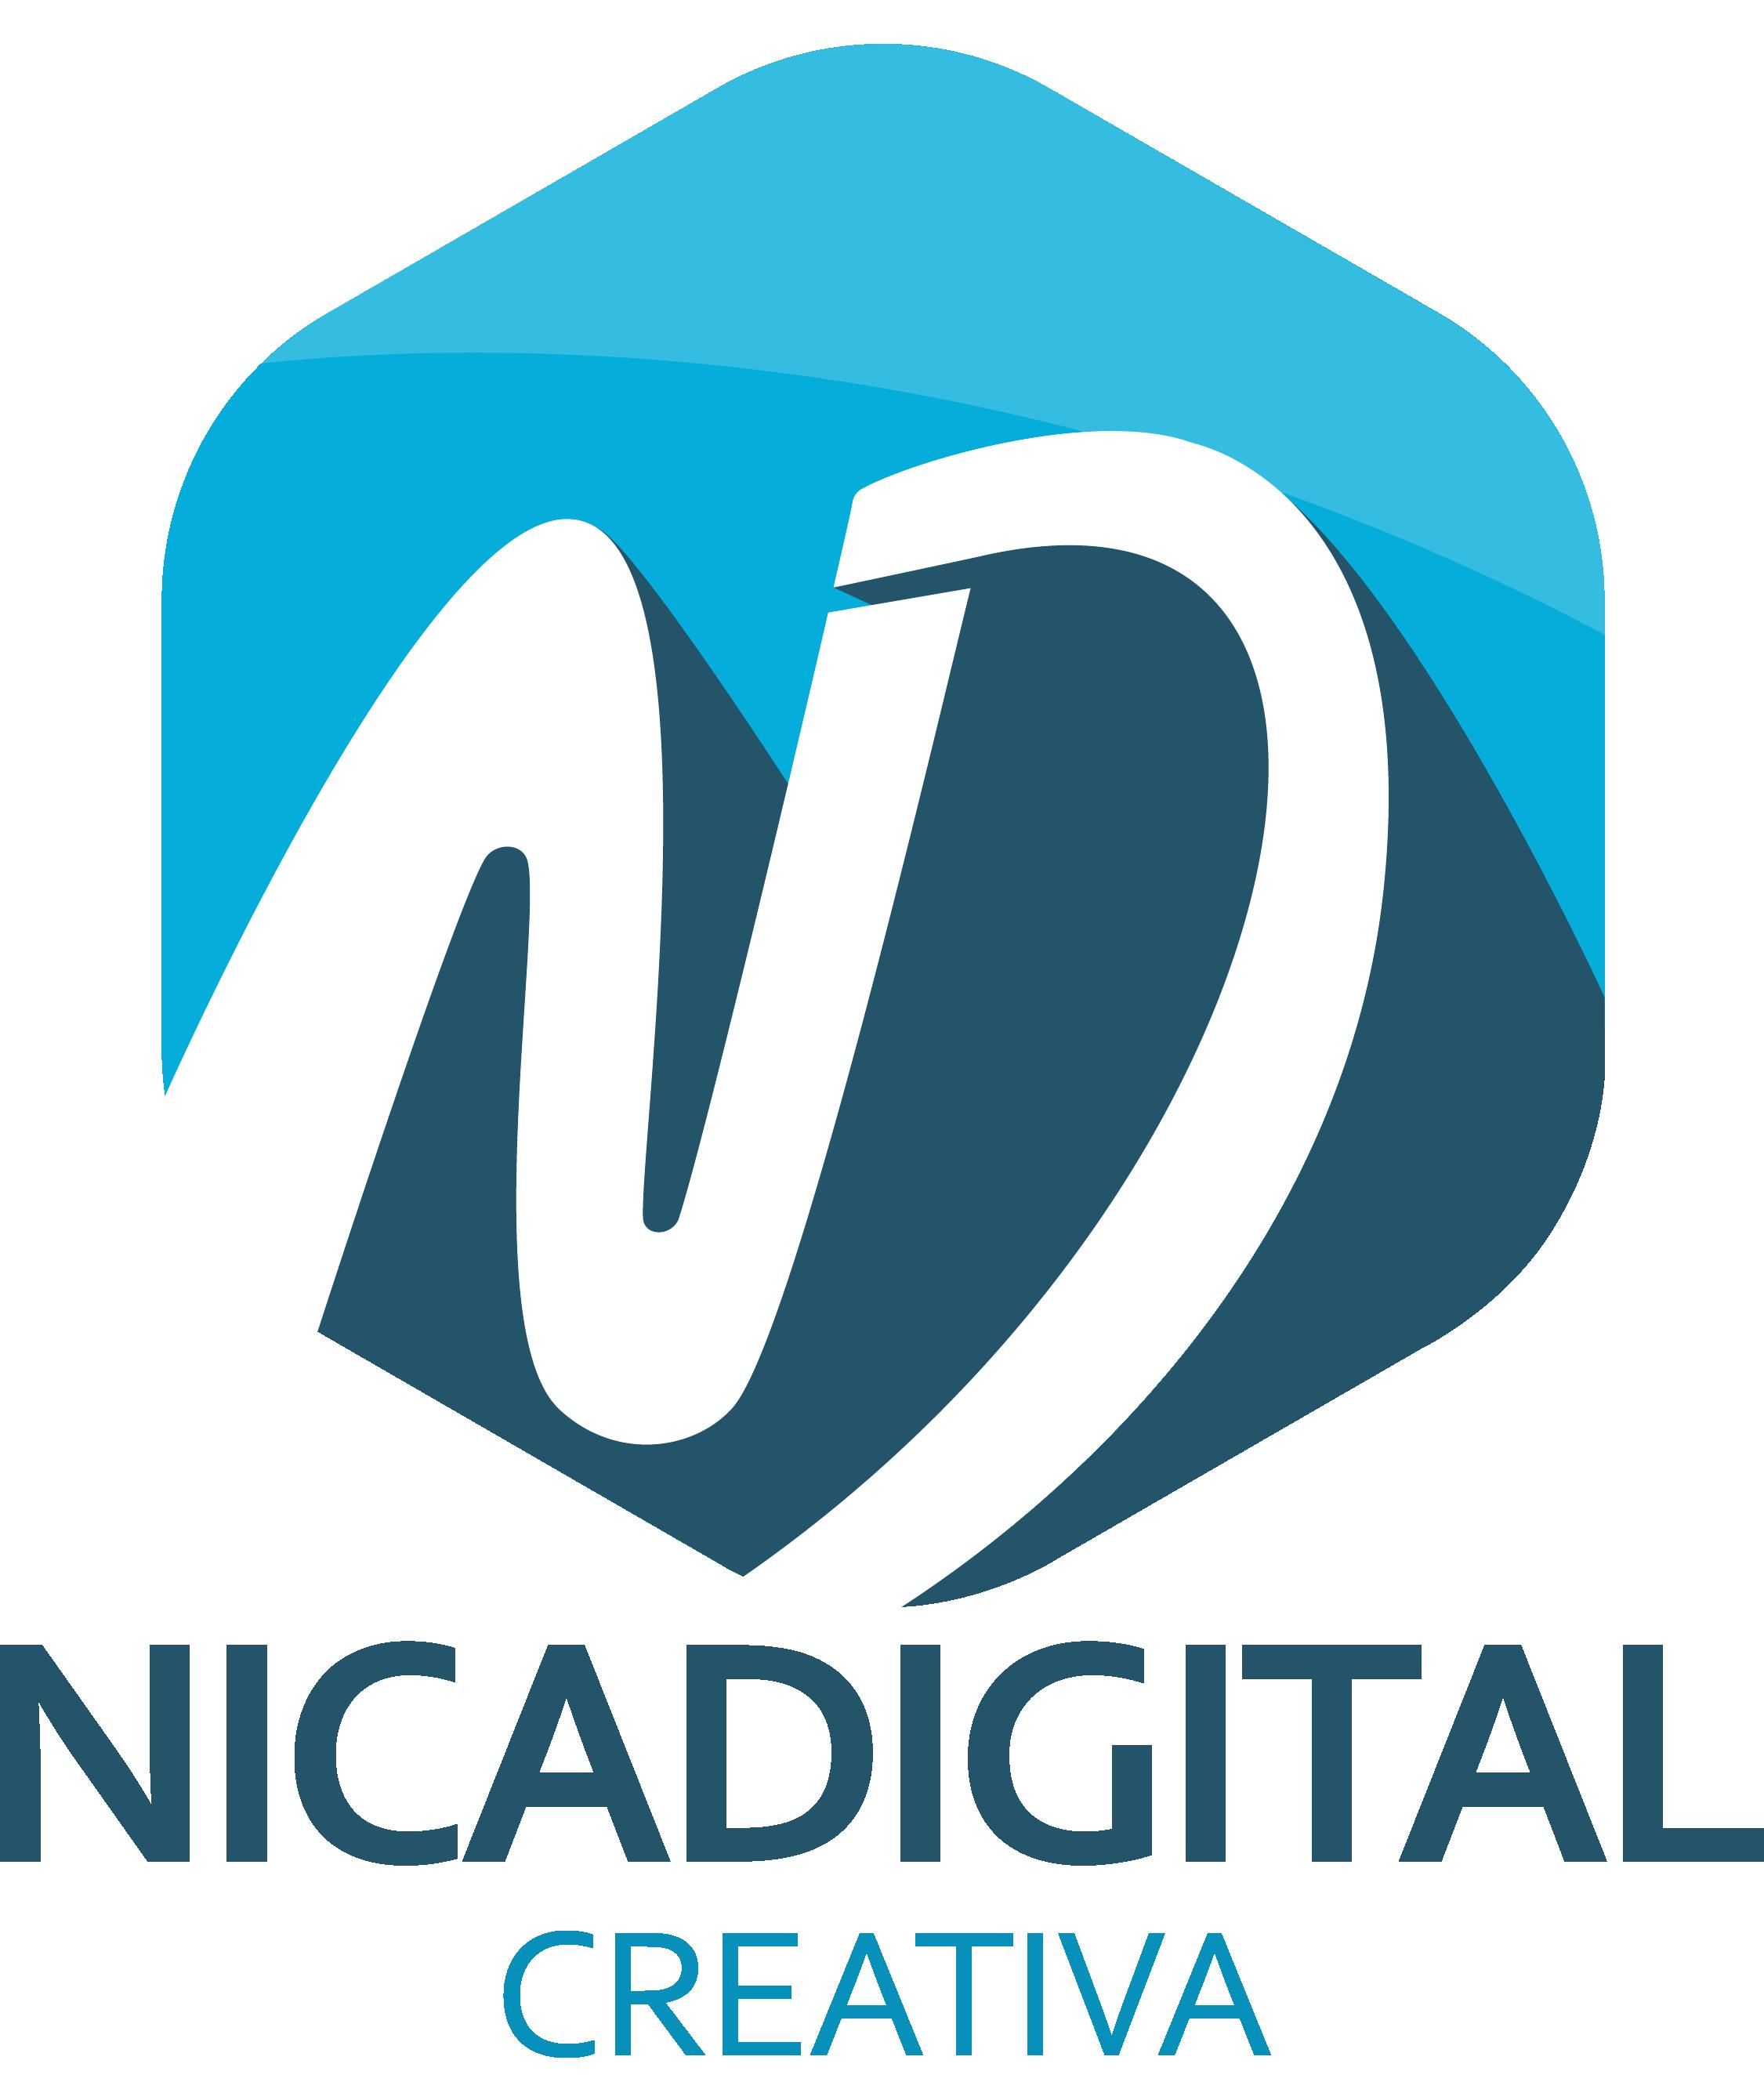 Nicadigital